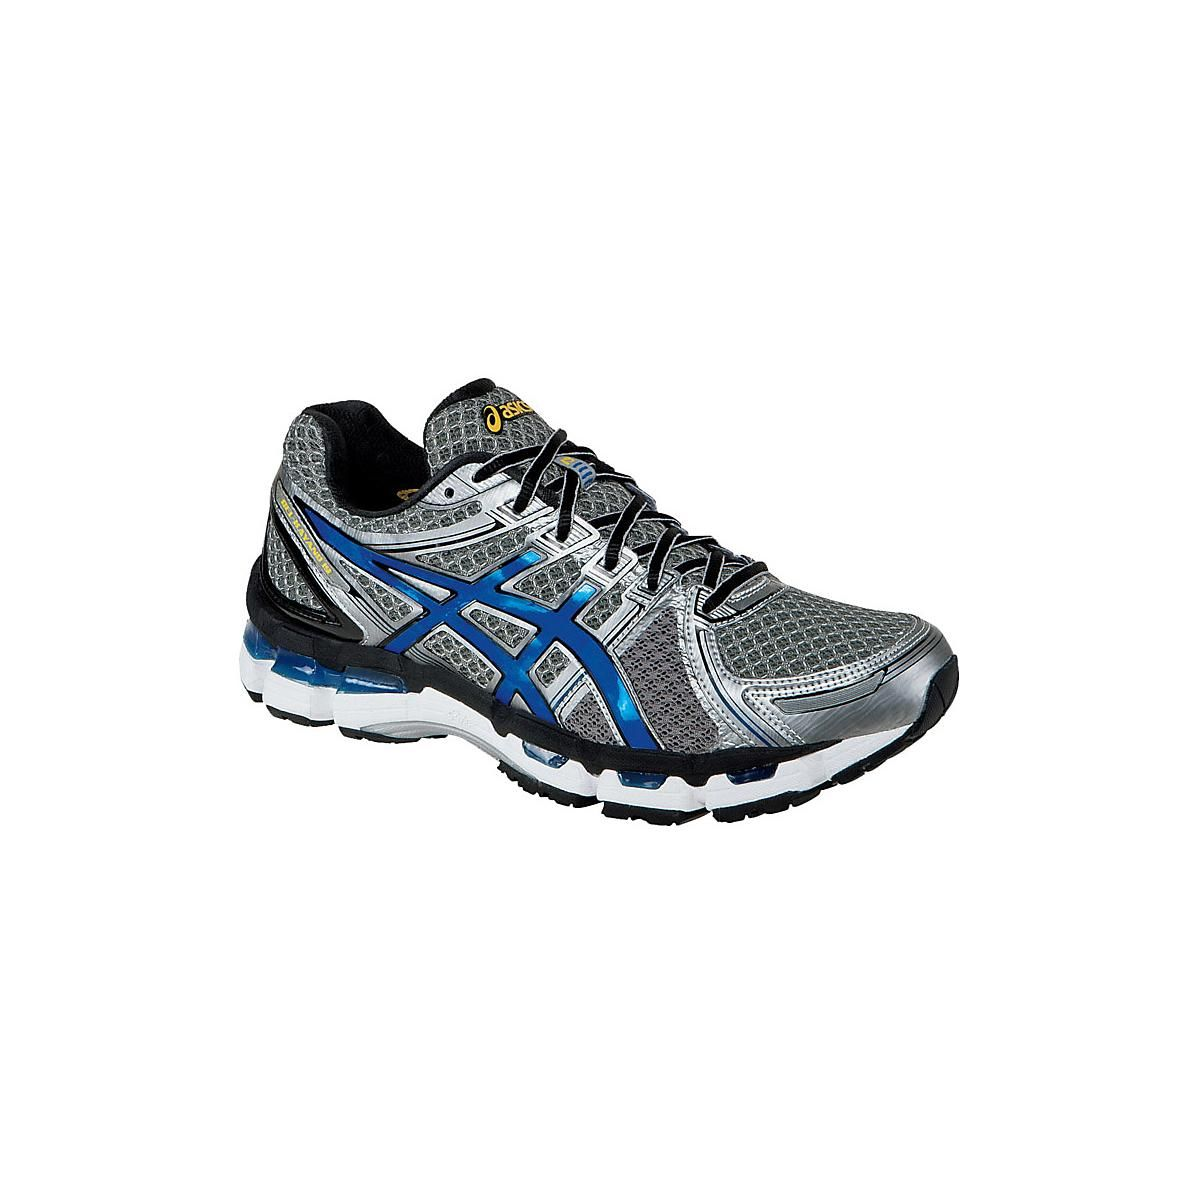 Gel Kayano 19 Top Running Shoes Shoes For Less Asics Gel Kayano 19